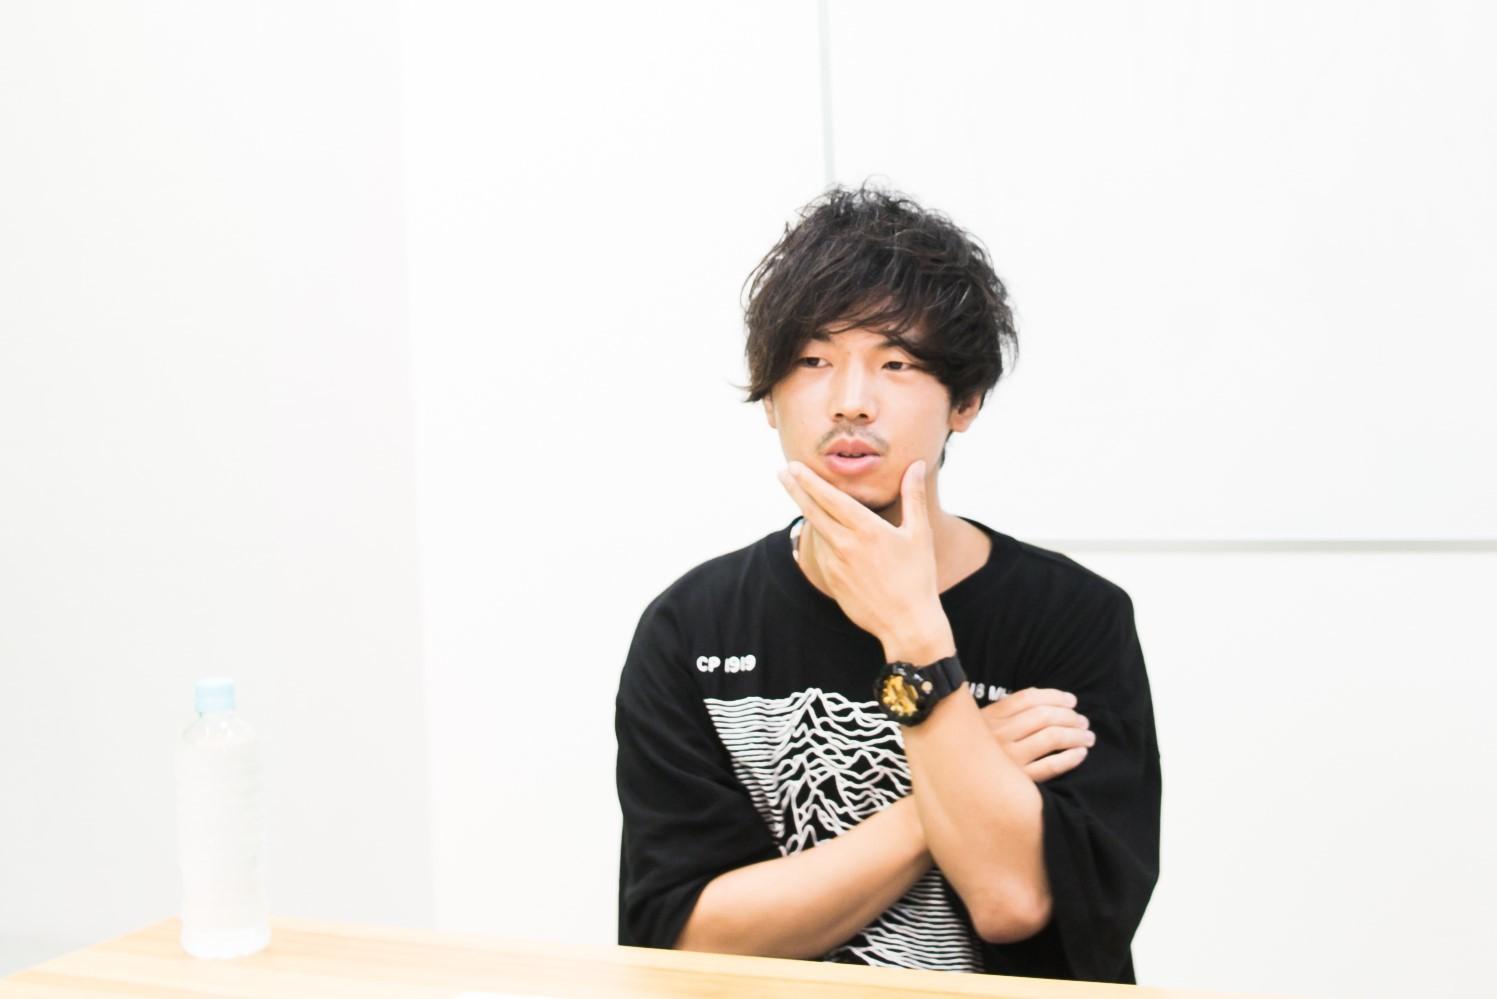 内田直孝(Rhythmic Toy World)